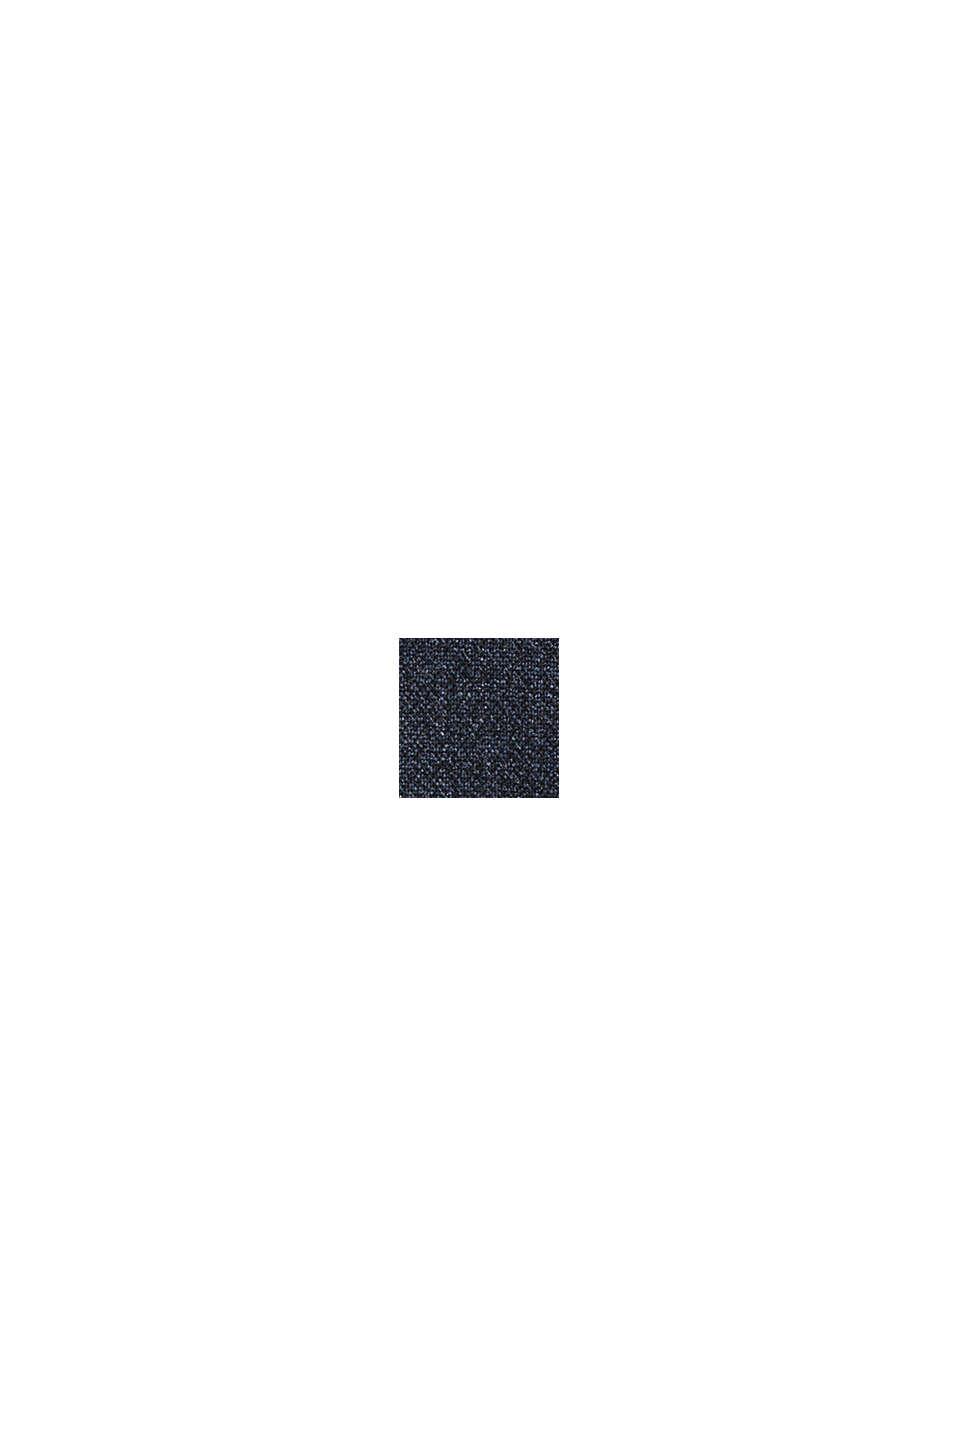 WINDOW CHECK Mix + Match Giacca elasticizzata, DARK BLUE, swatch